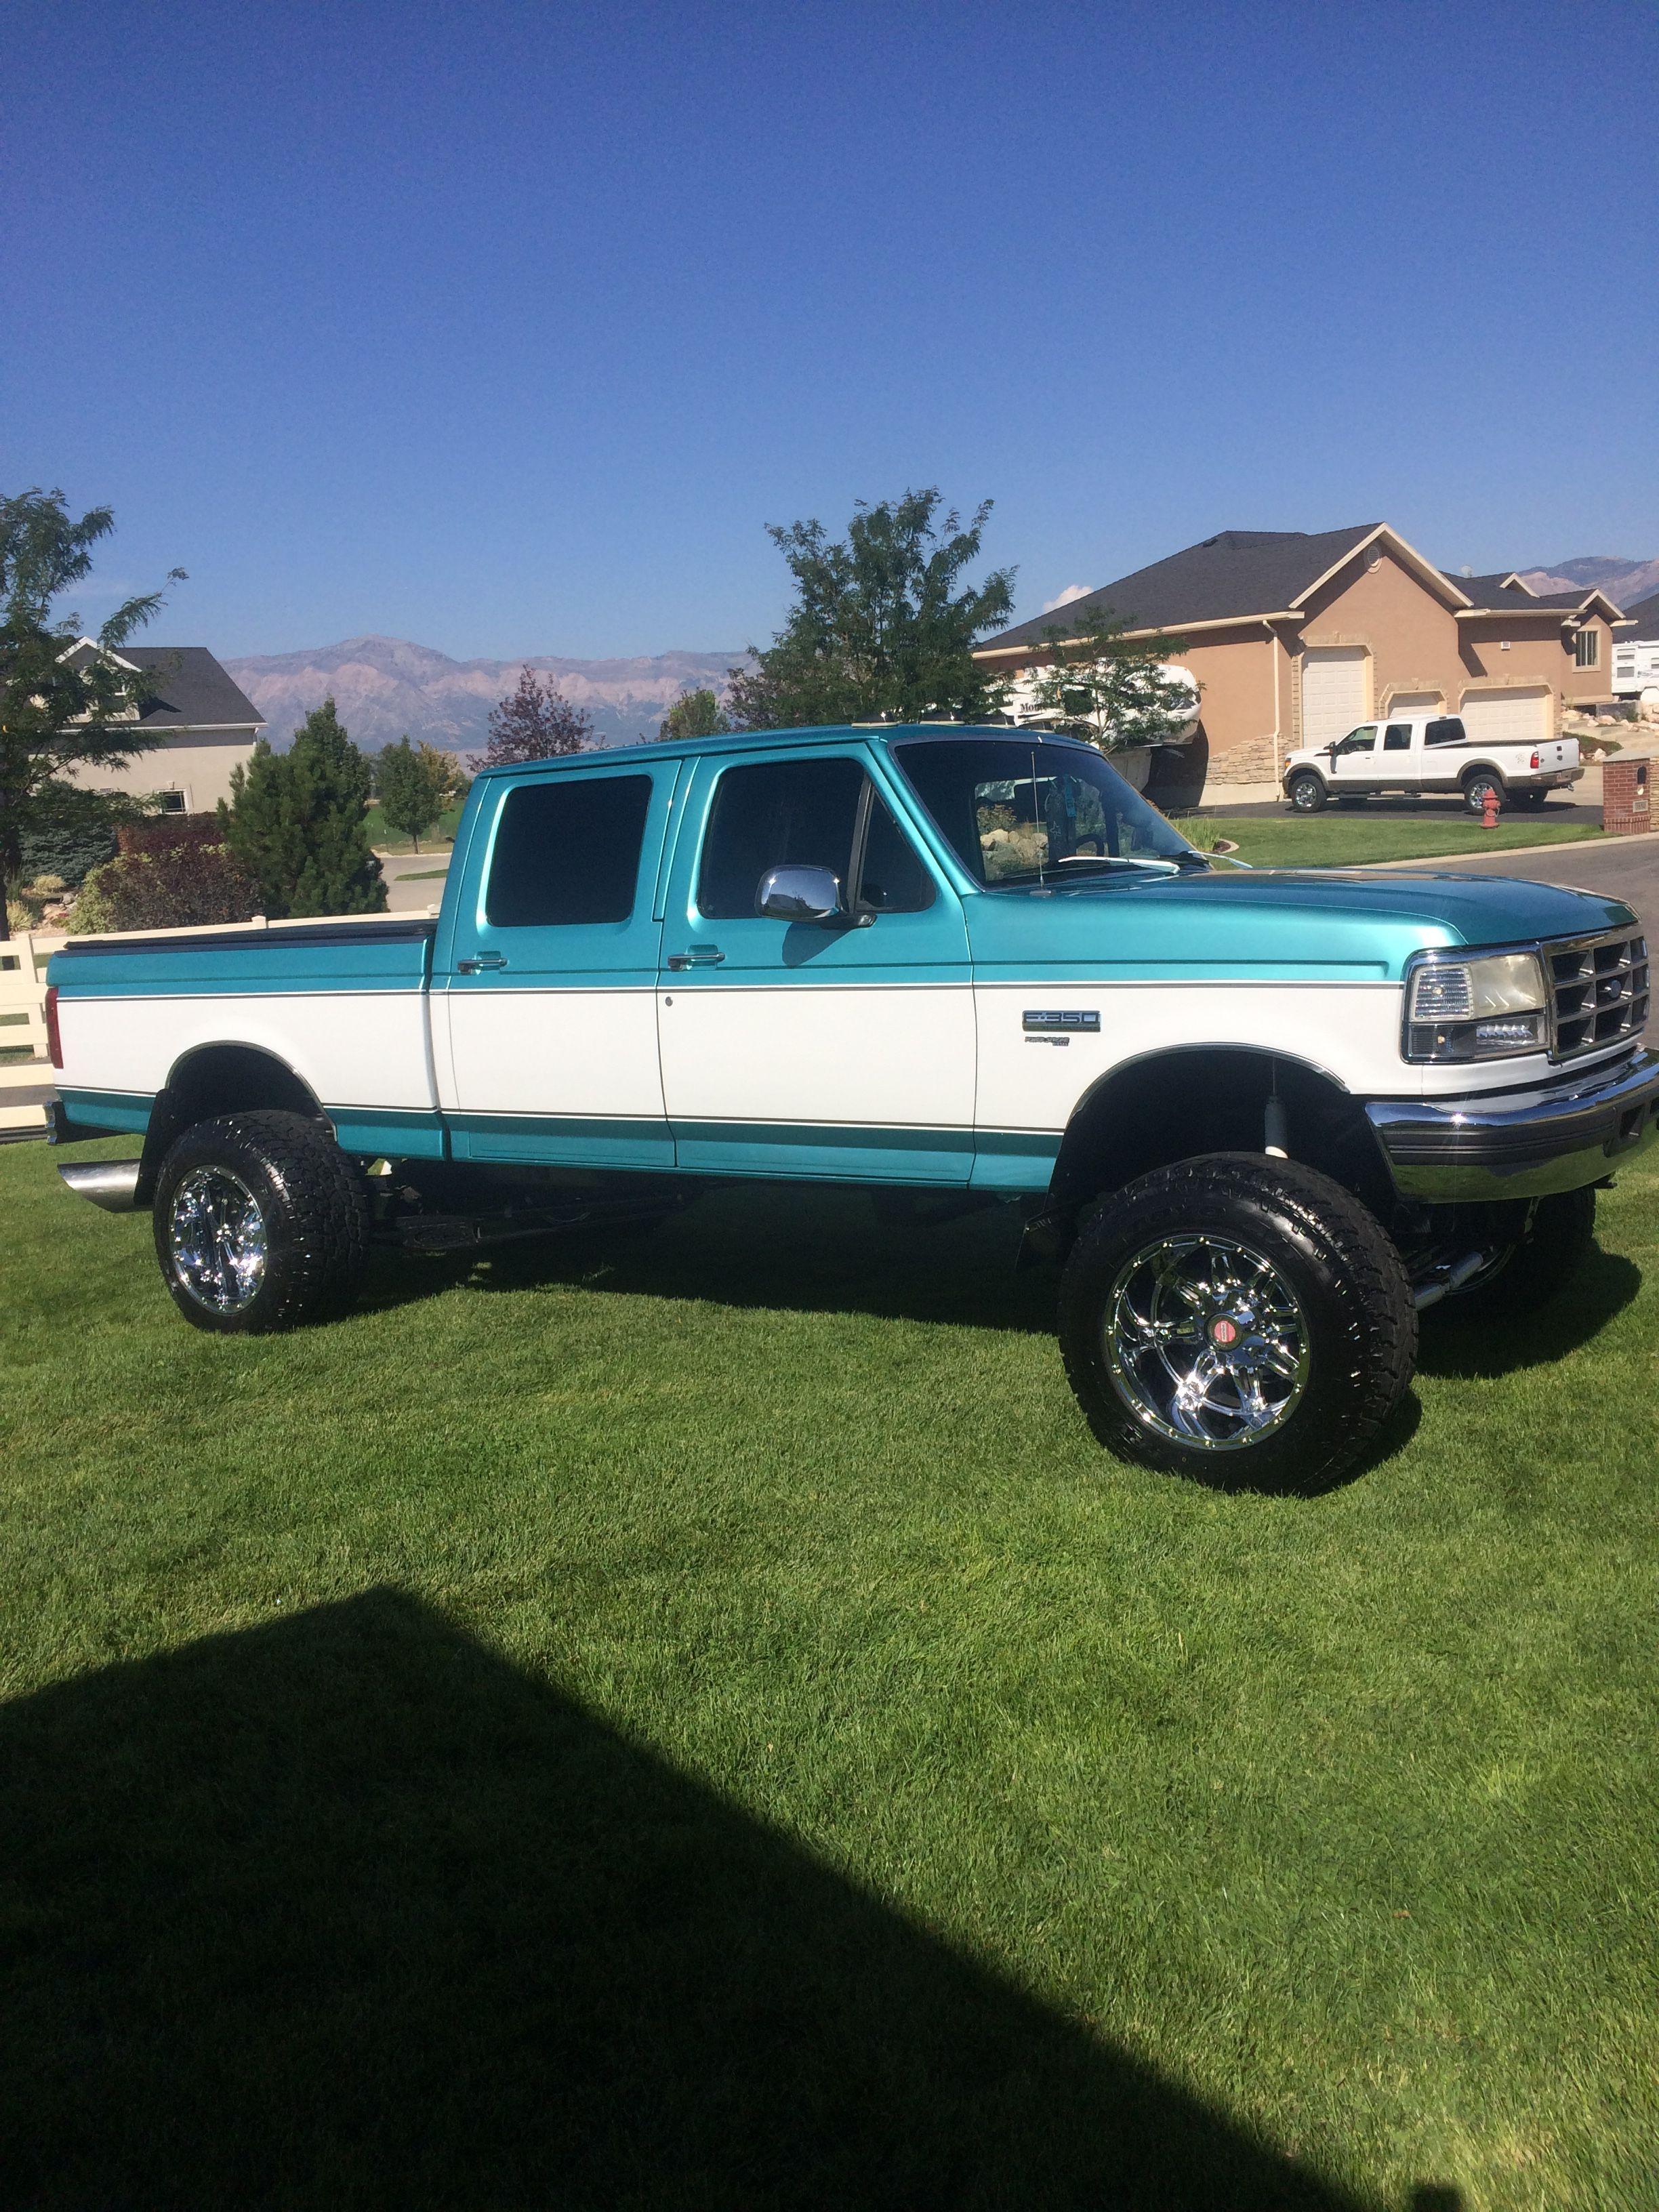 1996 Ford Short Bed Crewcab Powerstroke Jacked Up Trucks Trucks Diesel Trucks